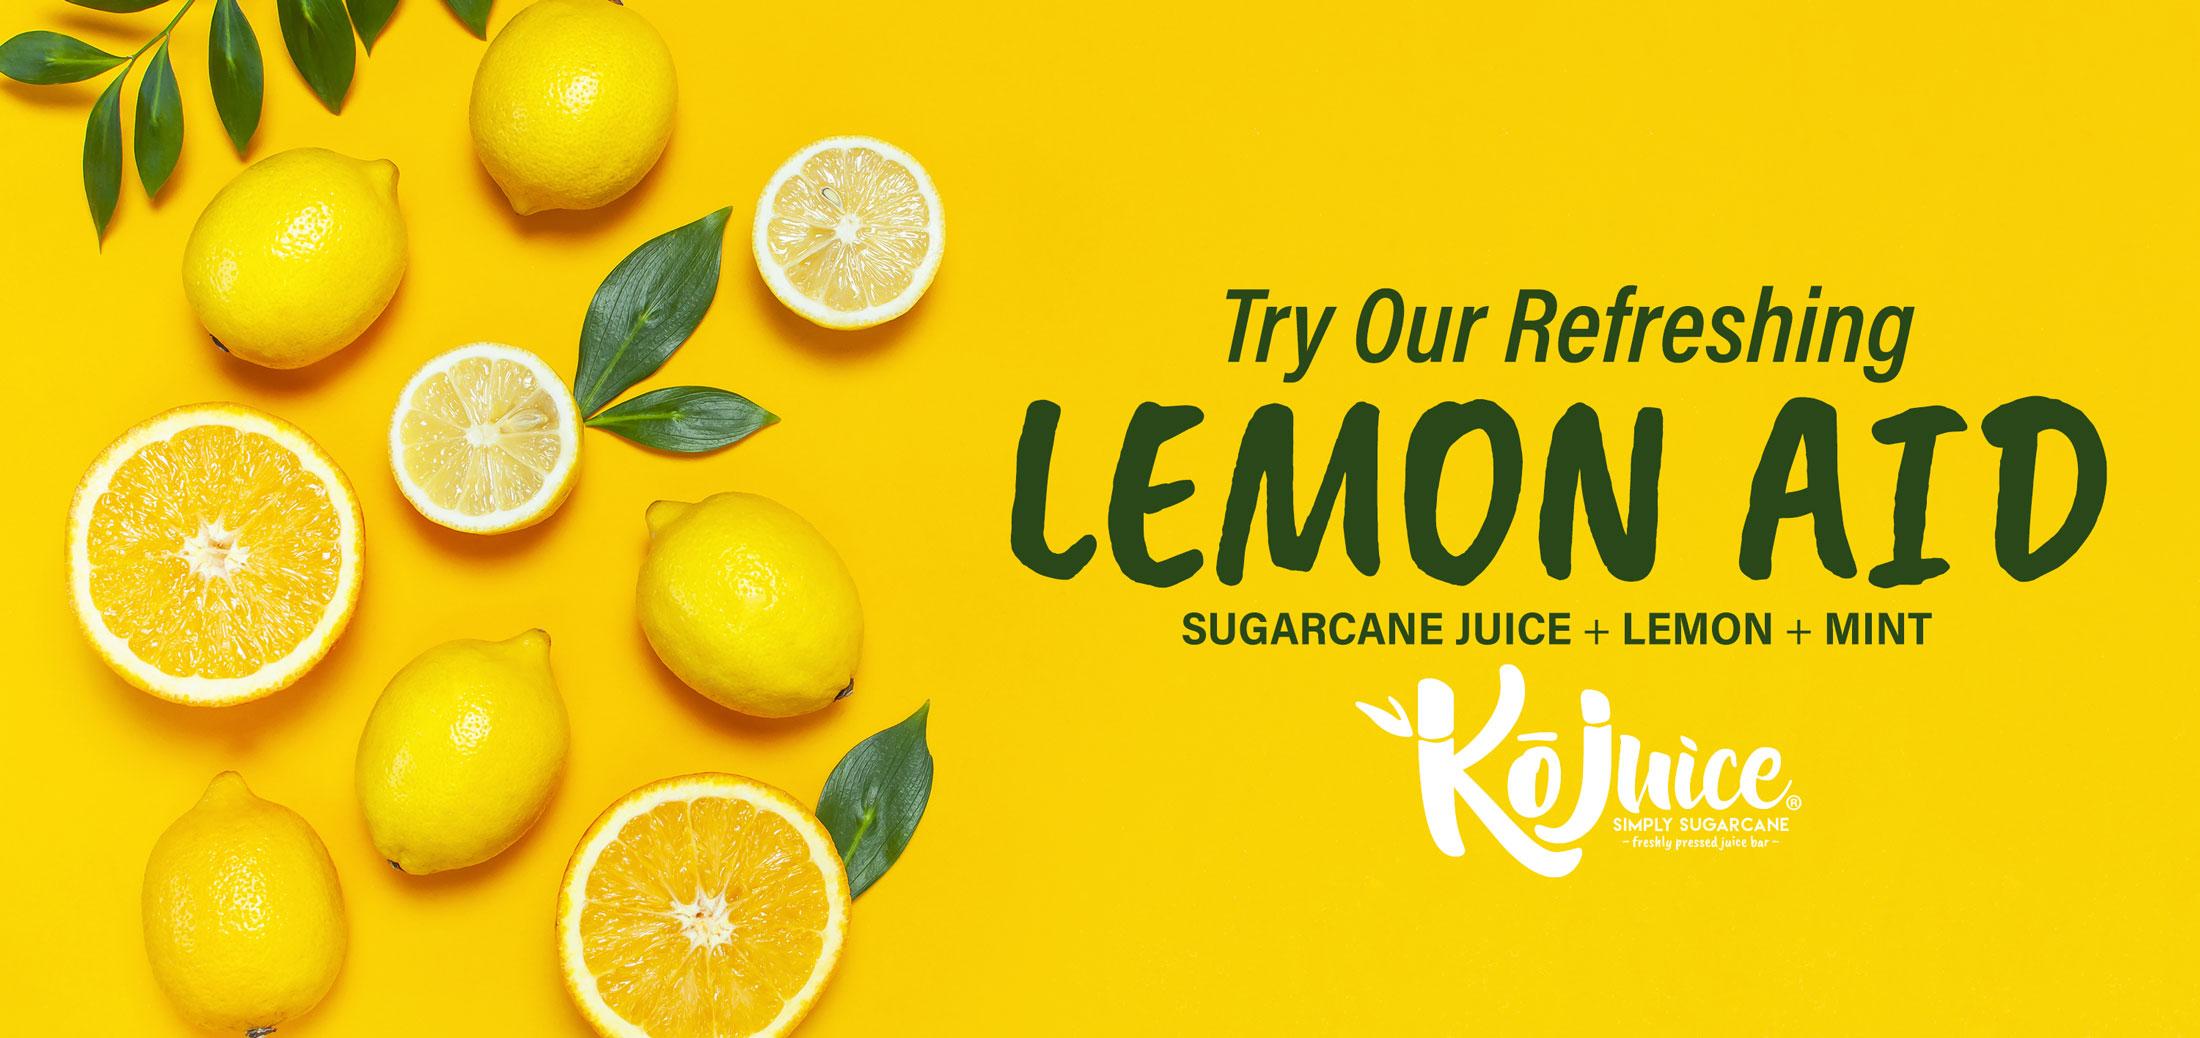 Ko Juice - Try Our Refreshing Lemon Aid Sugarcane Juice